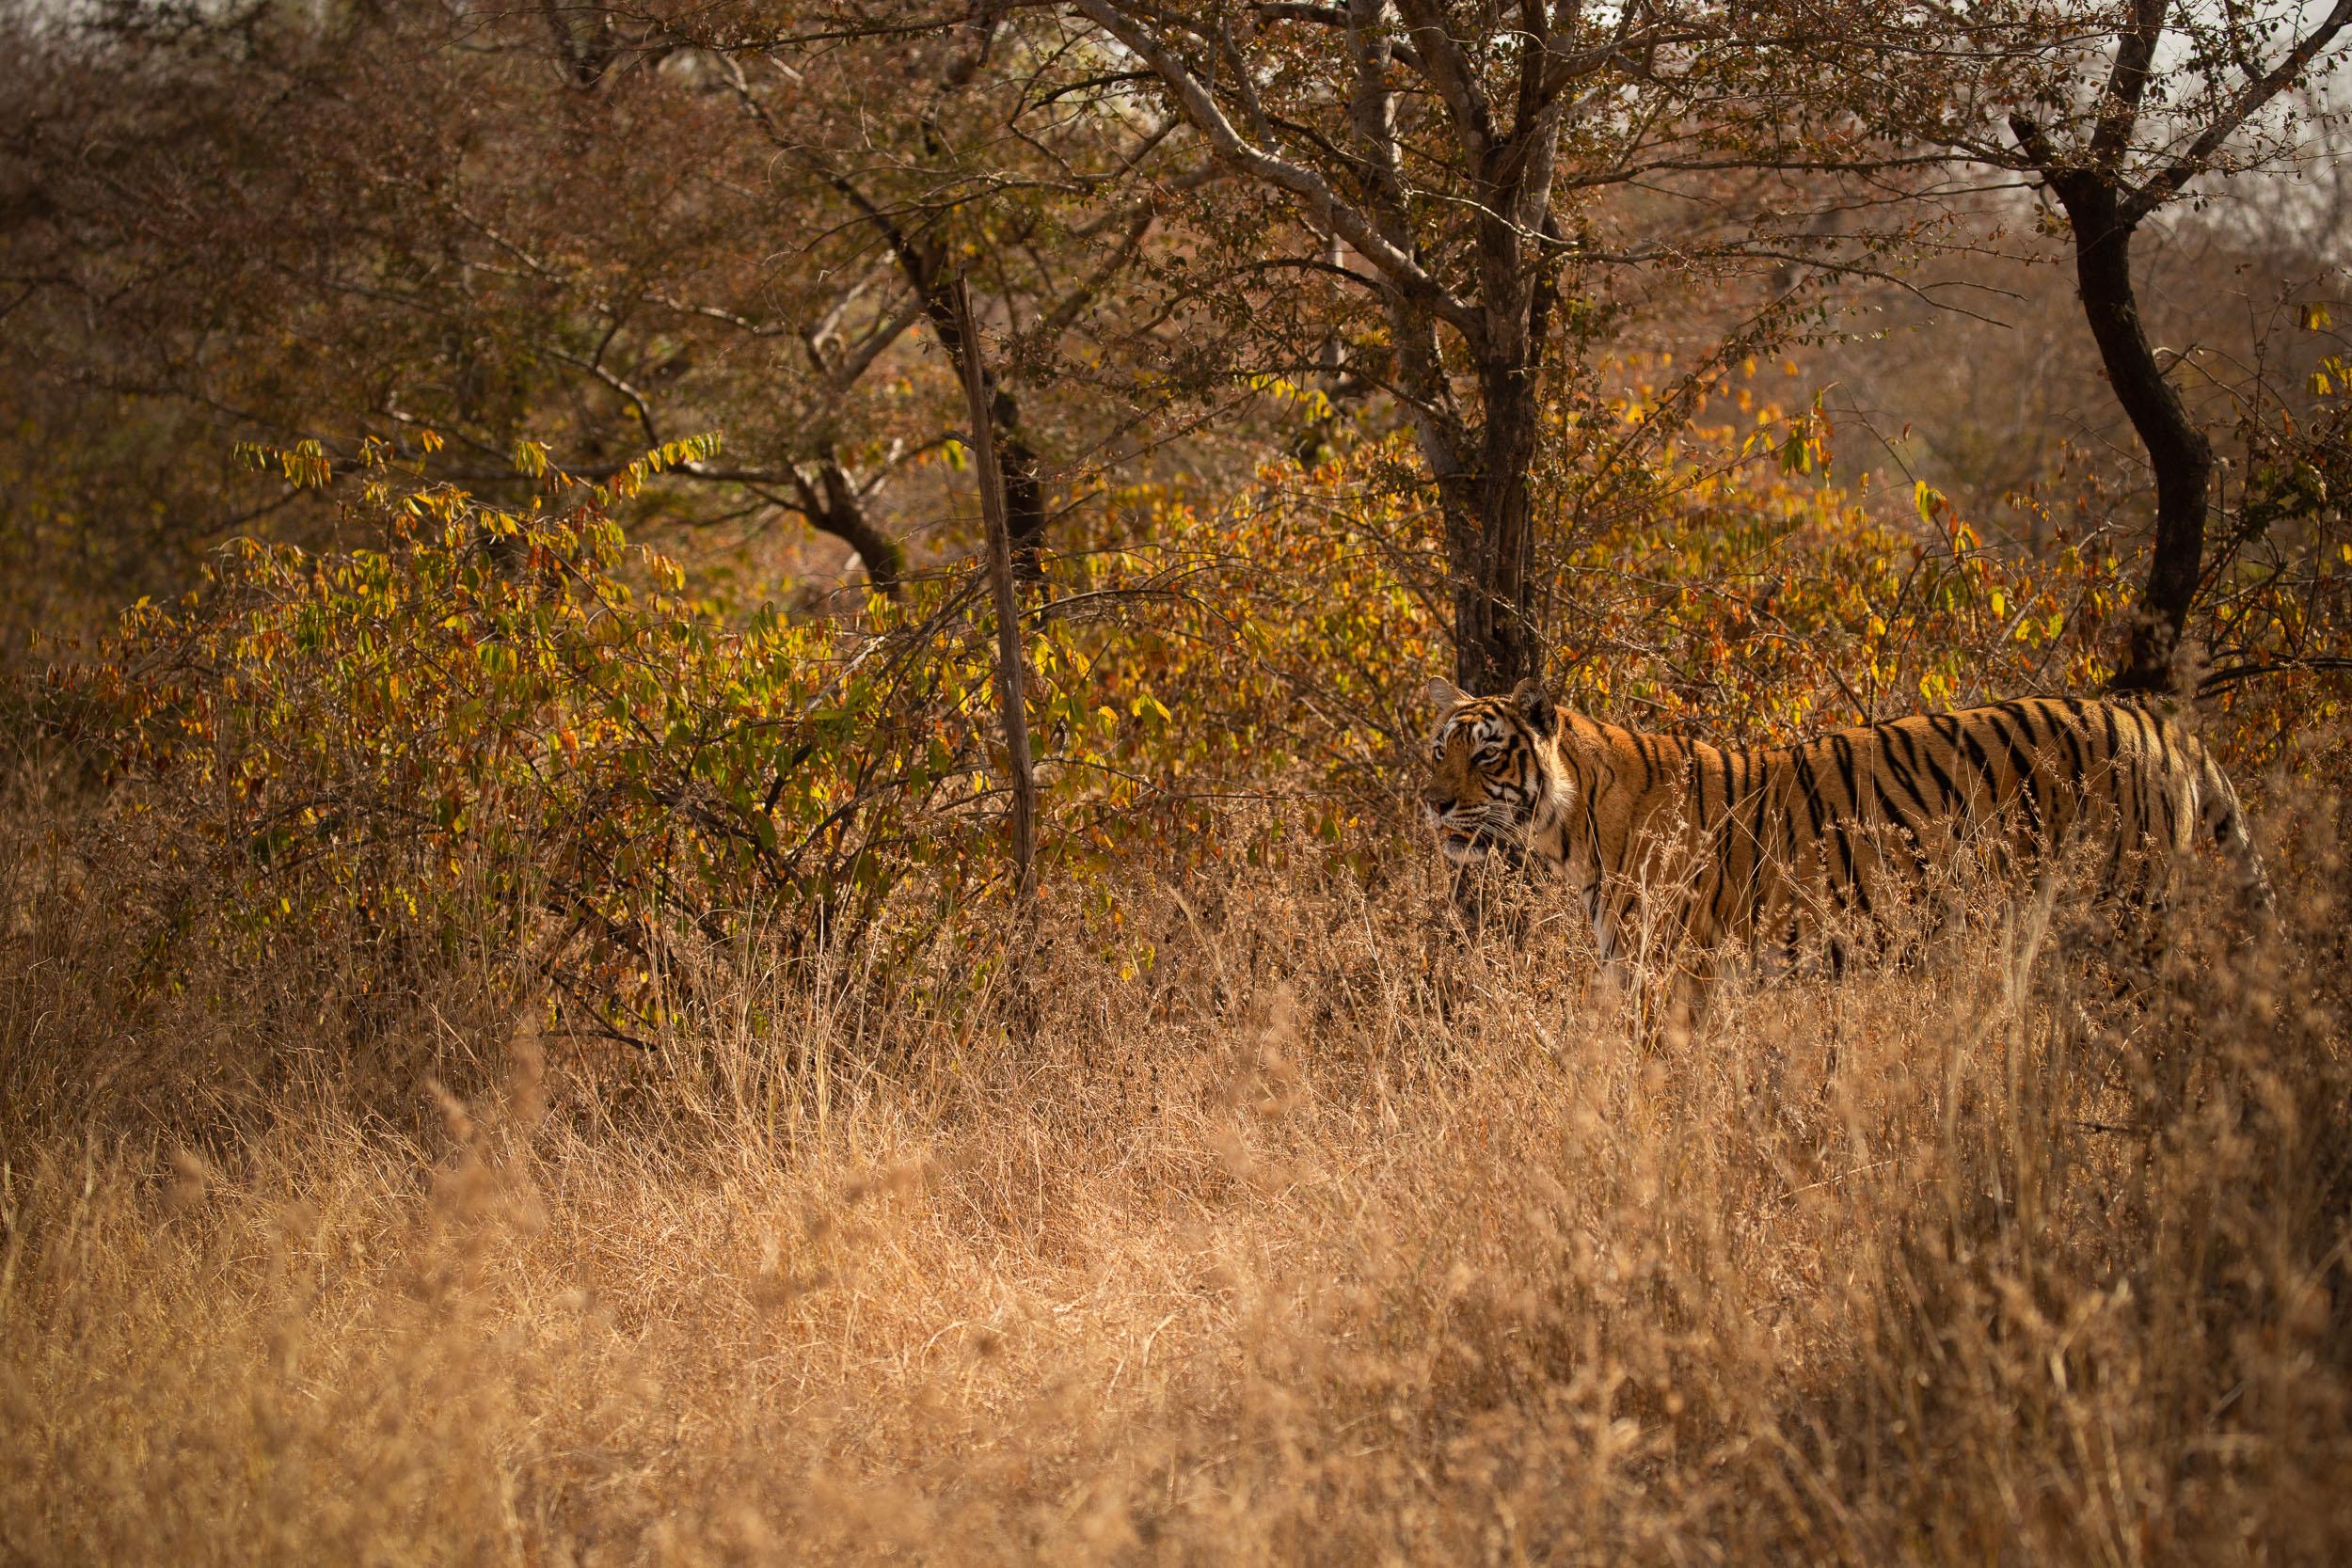 yorkshire_wildlife_photographer-8.jpg